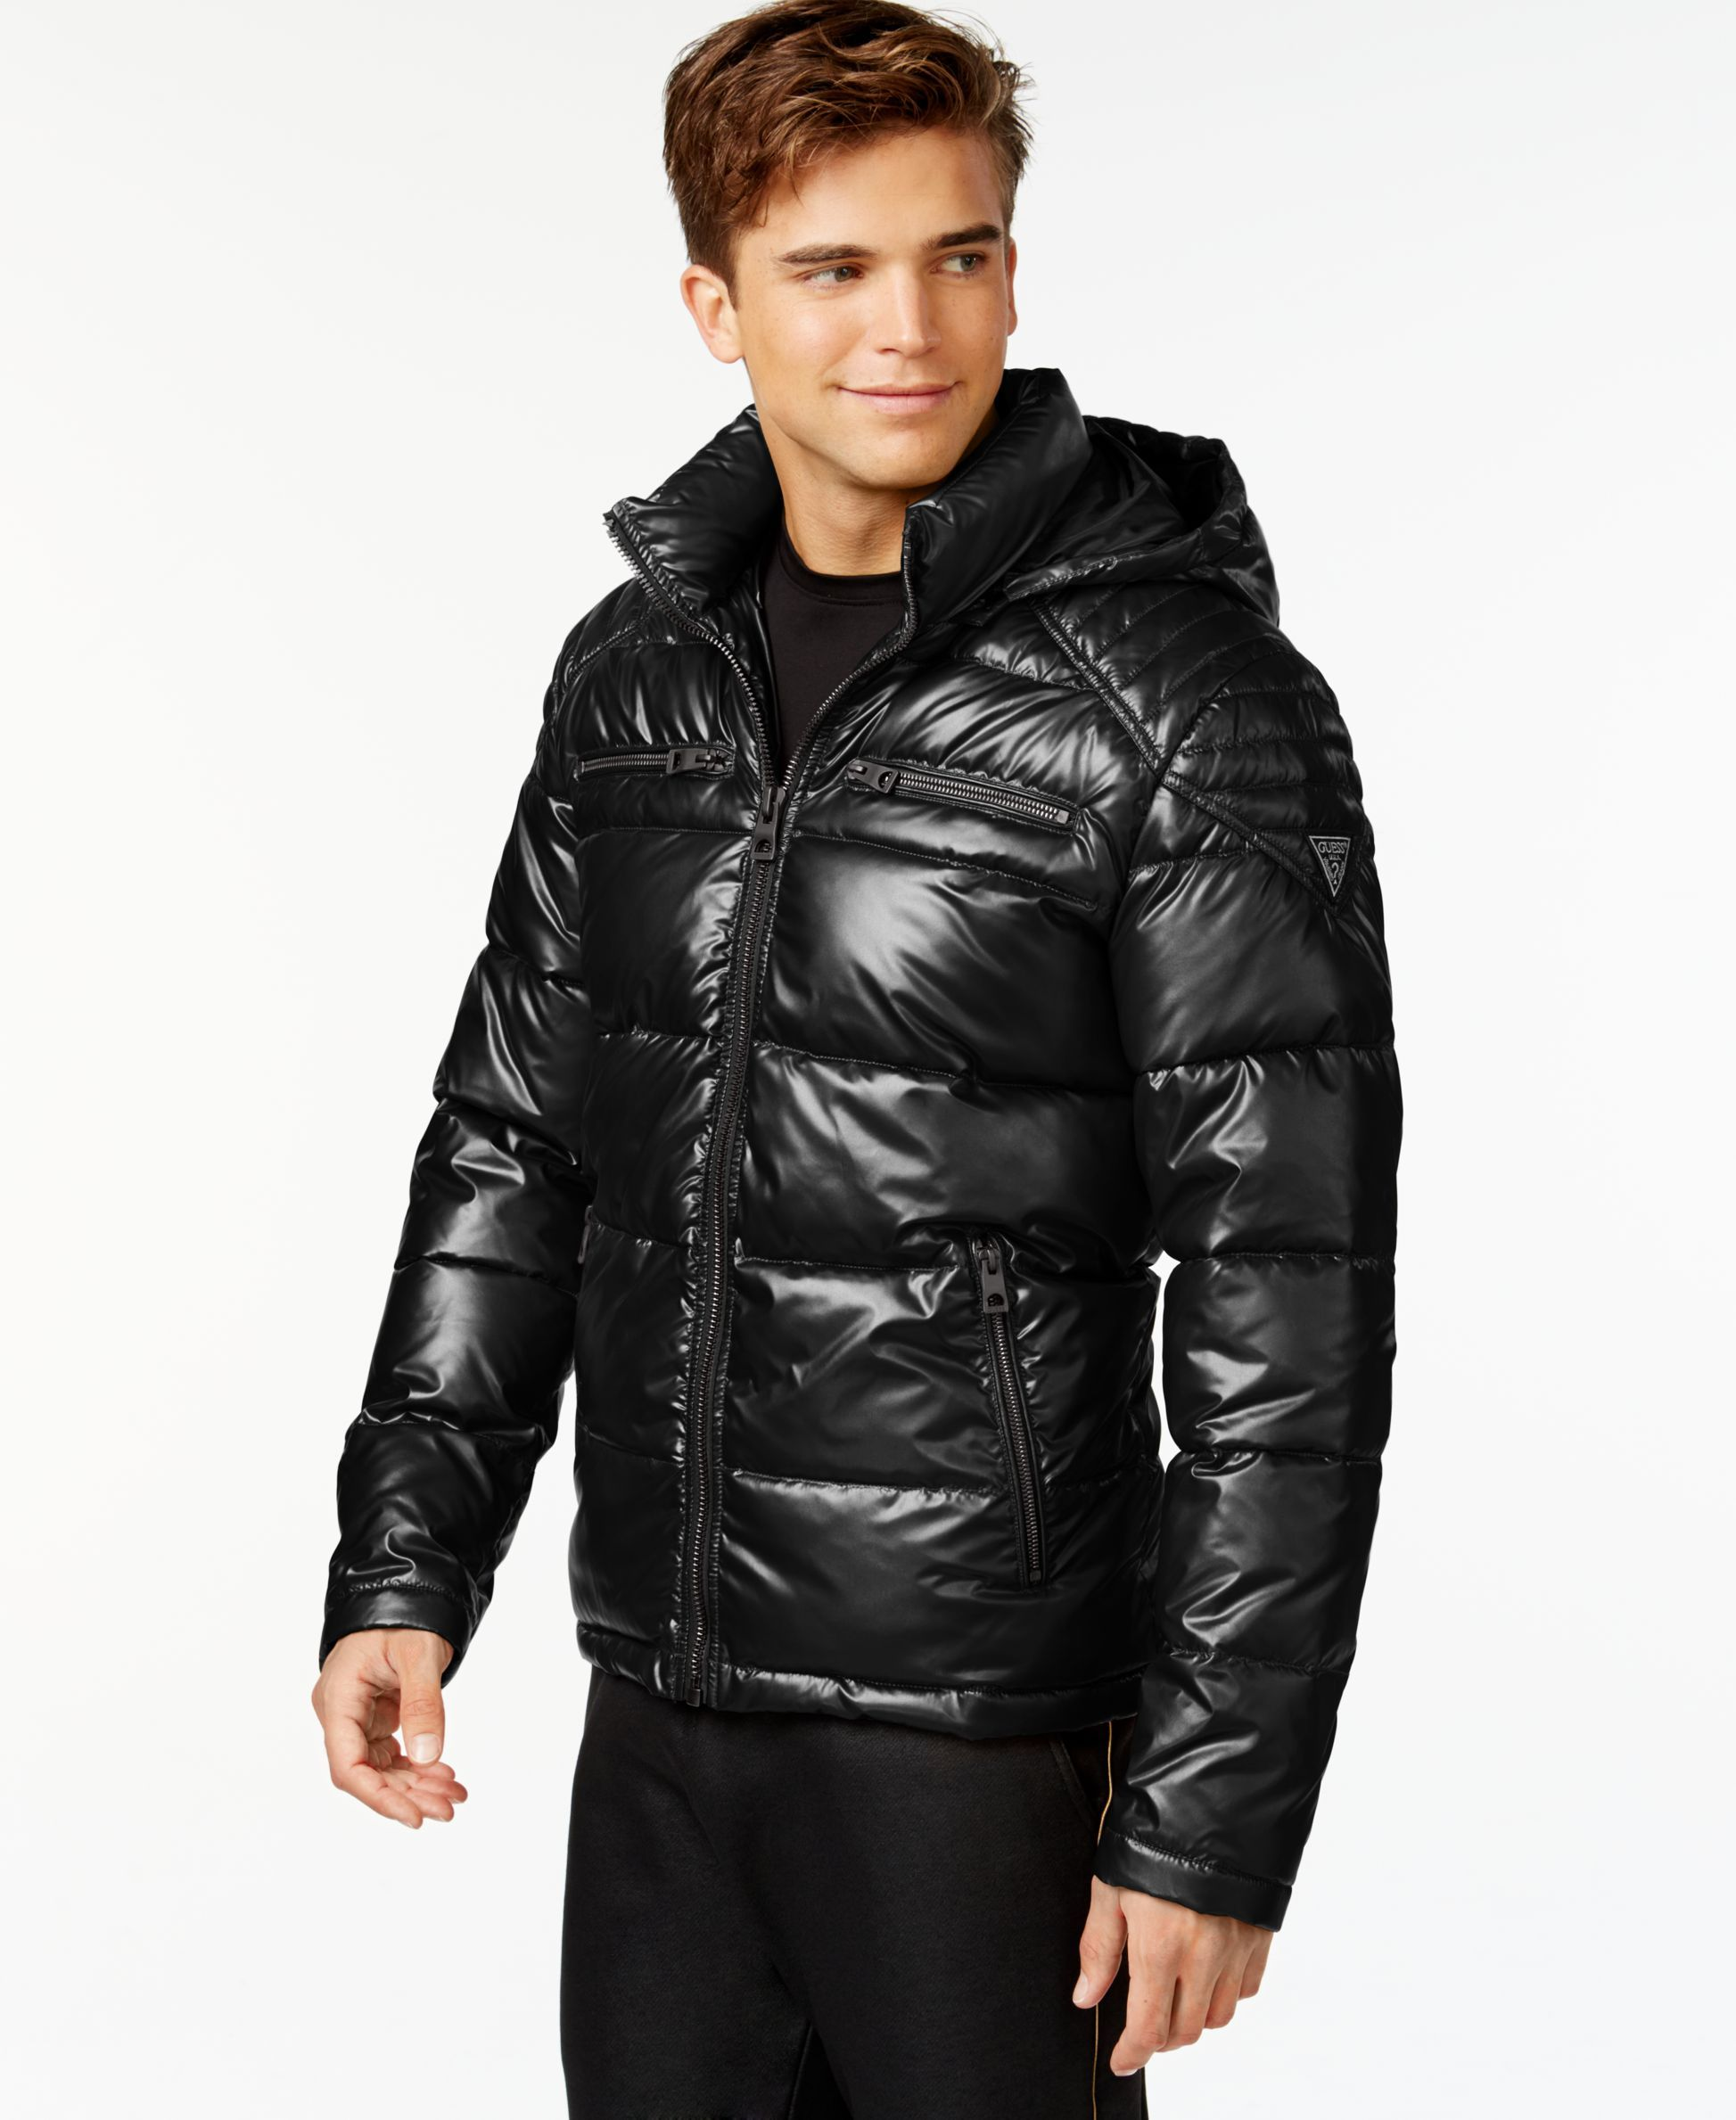 Guess Hooded Puffer Jacket Coats Jackets Men Macy S Jackets Shiny Jacket Mens Jackets [ 2378 x 1947 Pixel ]